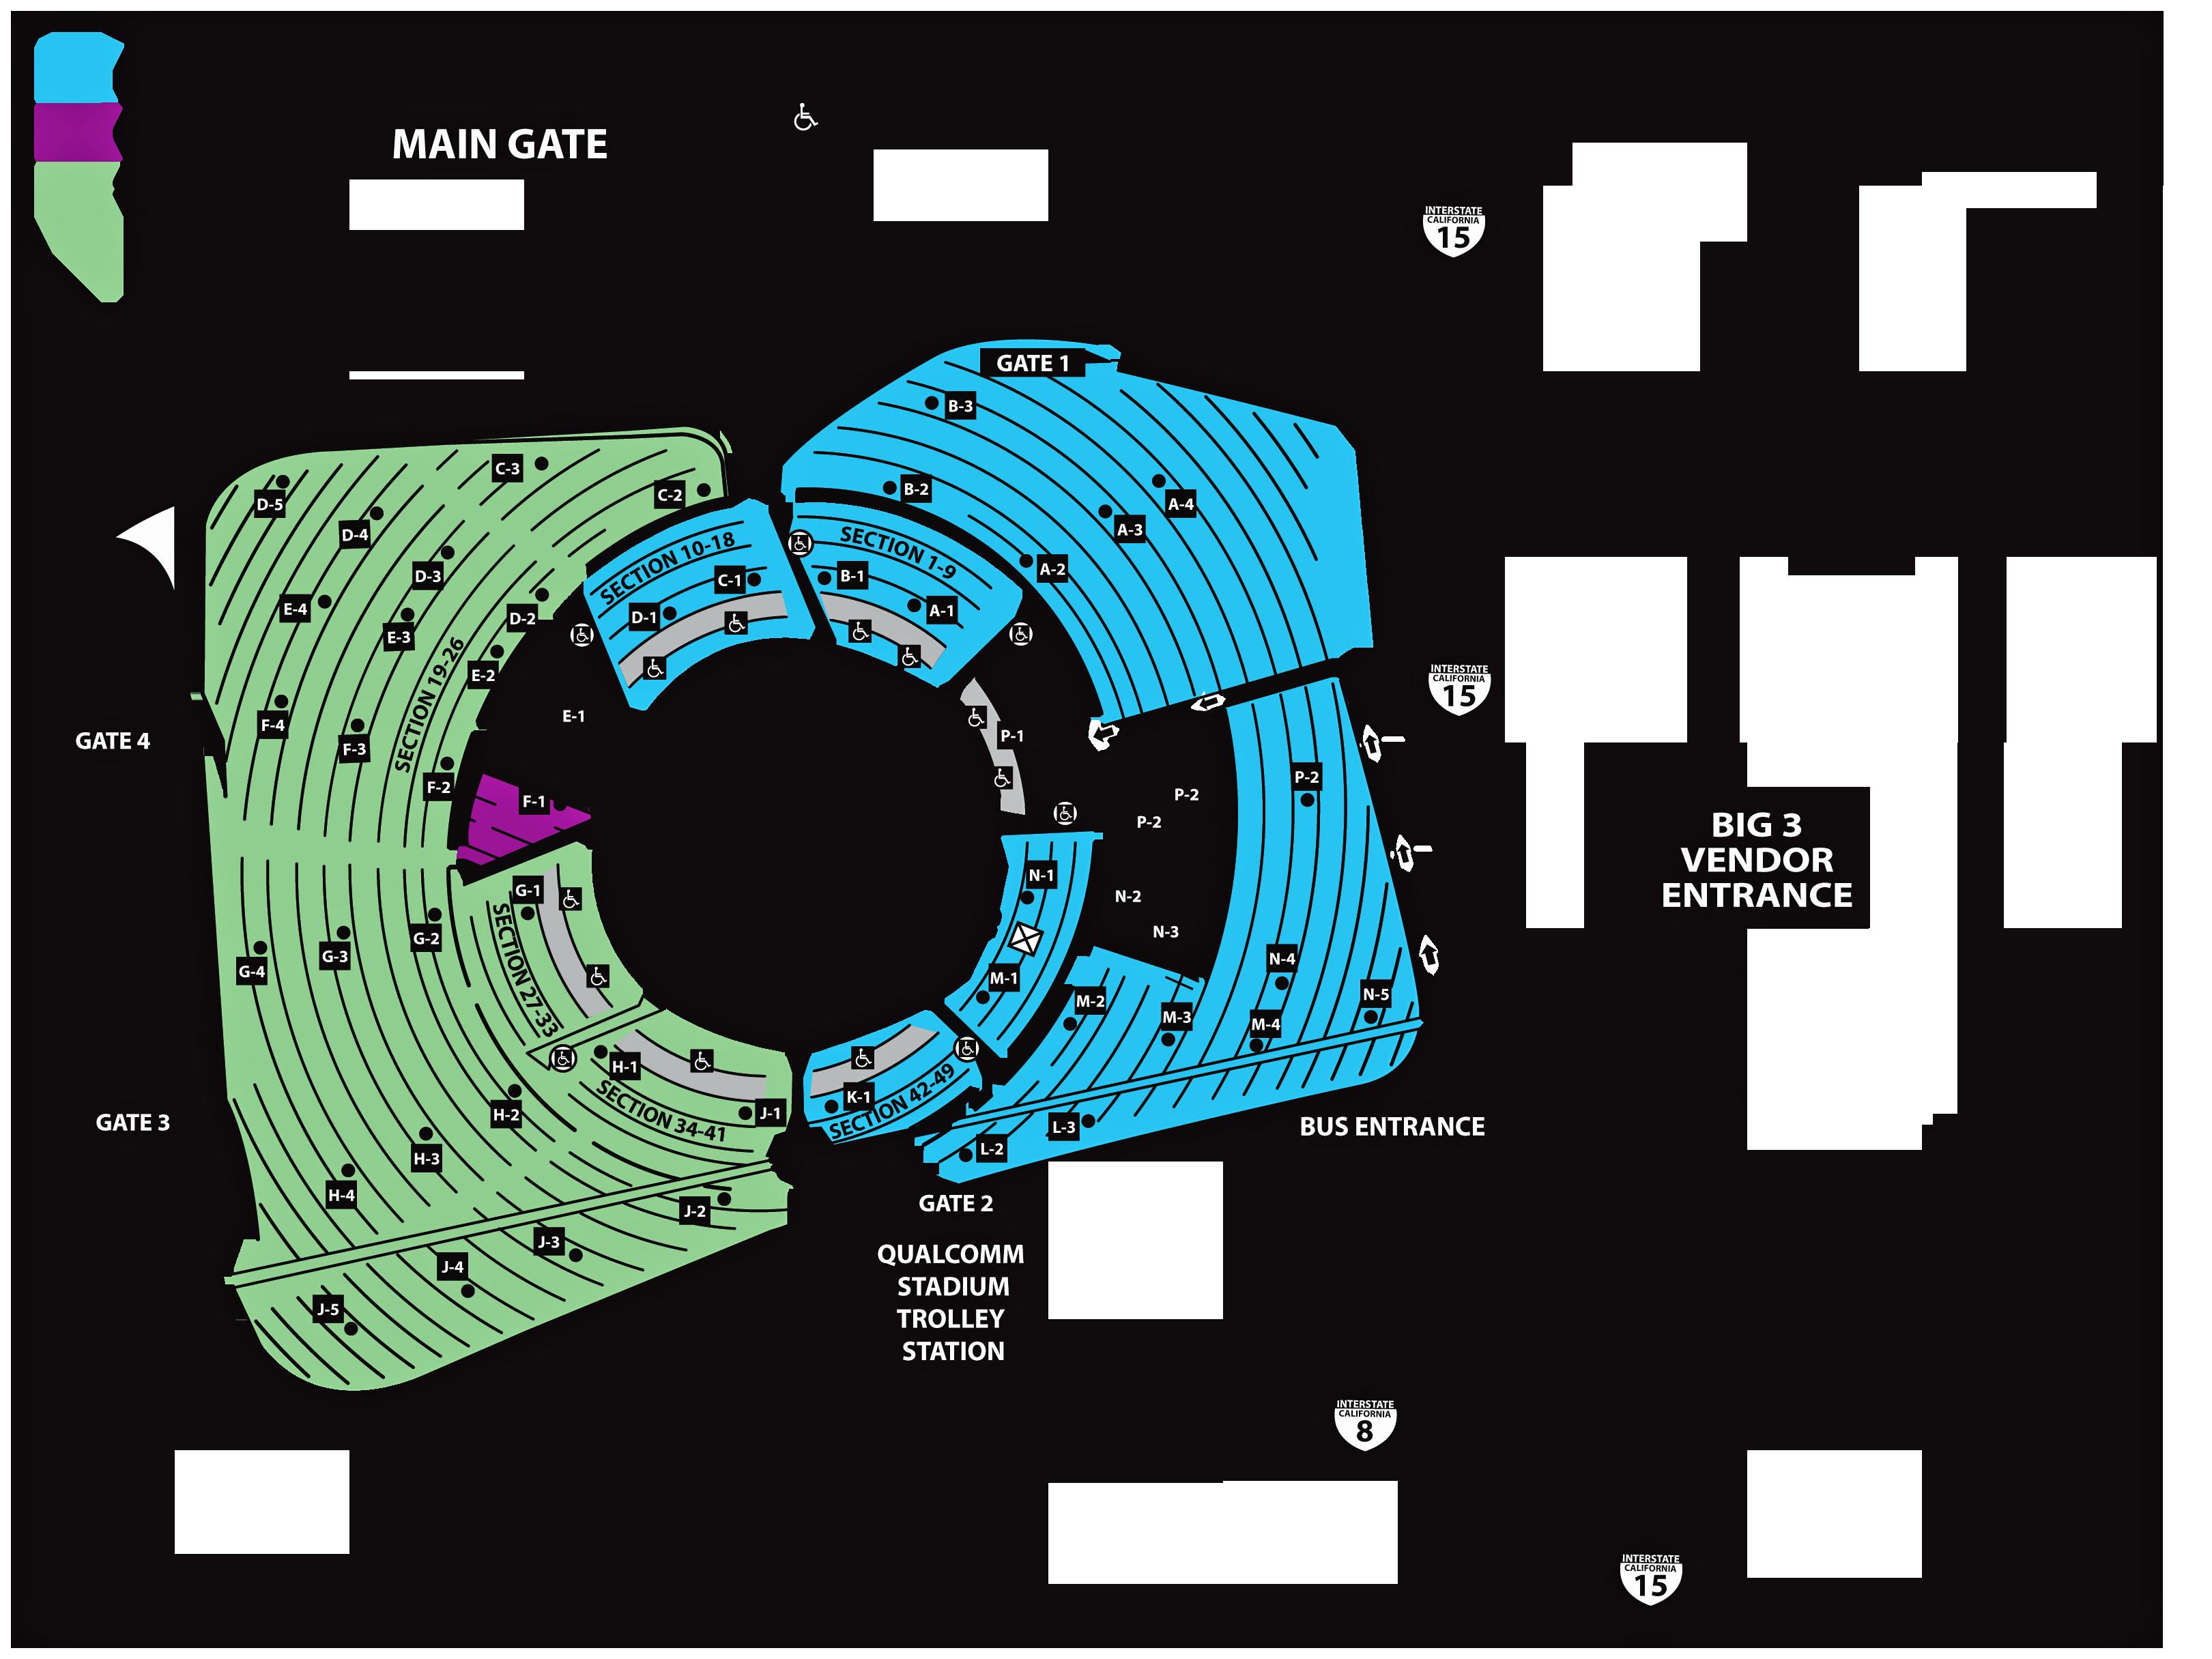 BIG 3 SWAP MEET MAPS - Big 3 Parts Exchange Qualcomm Stadium Map on farmers field map, davis wade stadium map, high point solutions stadium map, the coliseum map, oracle stadium map, cowboys stadium map, o.co coliseum map, lockhart stadium map, charlotte knights stadium map, pbs stadium map, new britain stadium map, yager stadium map, avaya stadium map, orlando city stadium map, chargers stadium map, waldo stadium map, verizon stadium map, tdecu stadium map, houston rodeo stadium map,